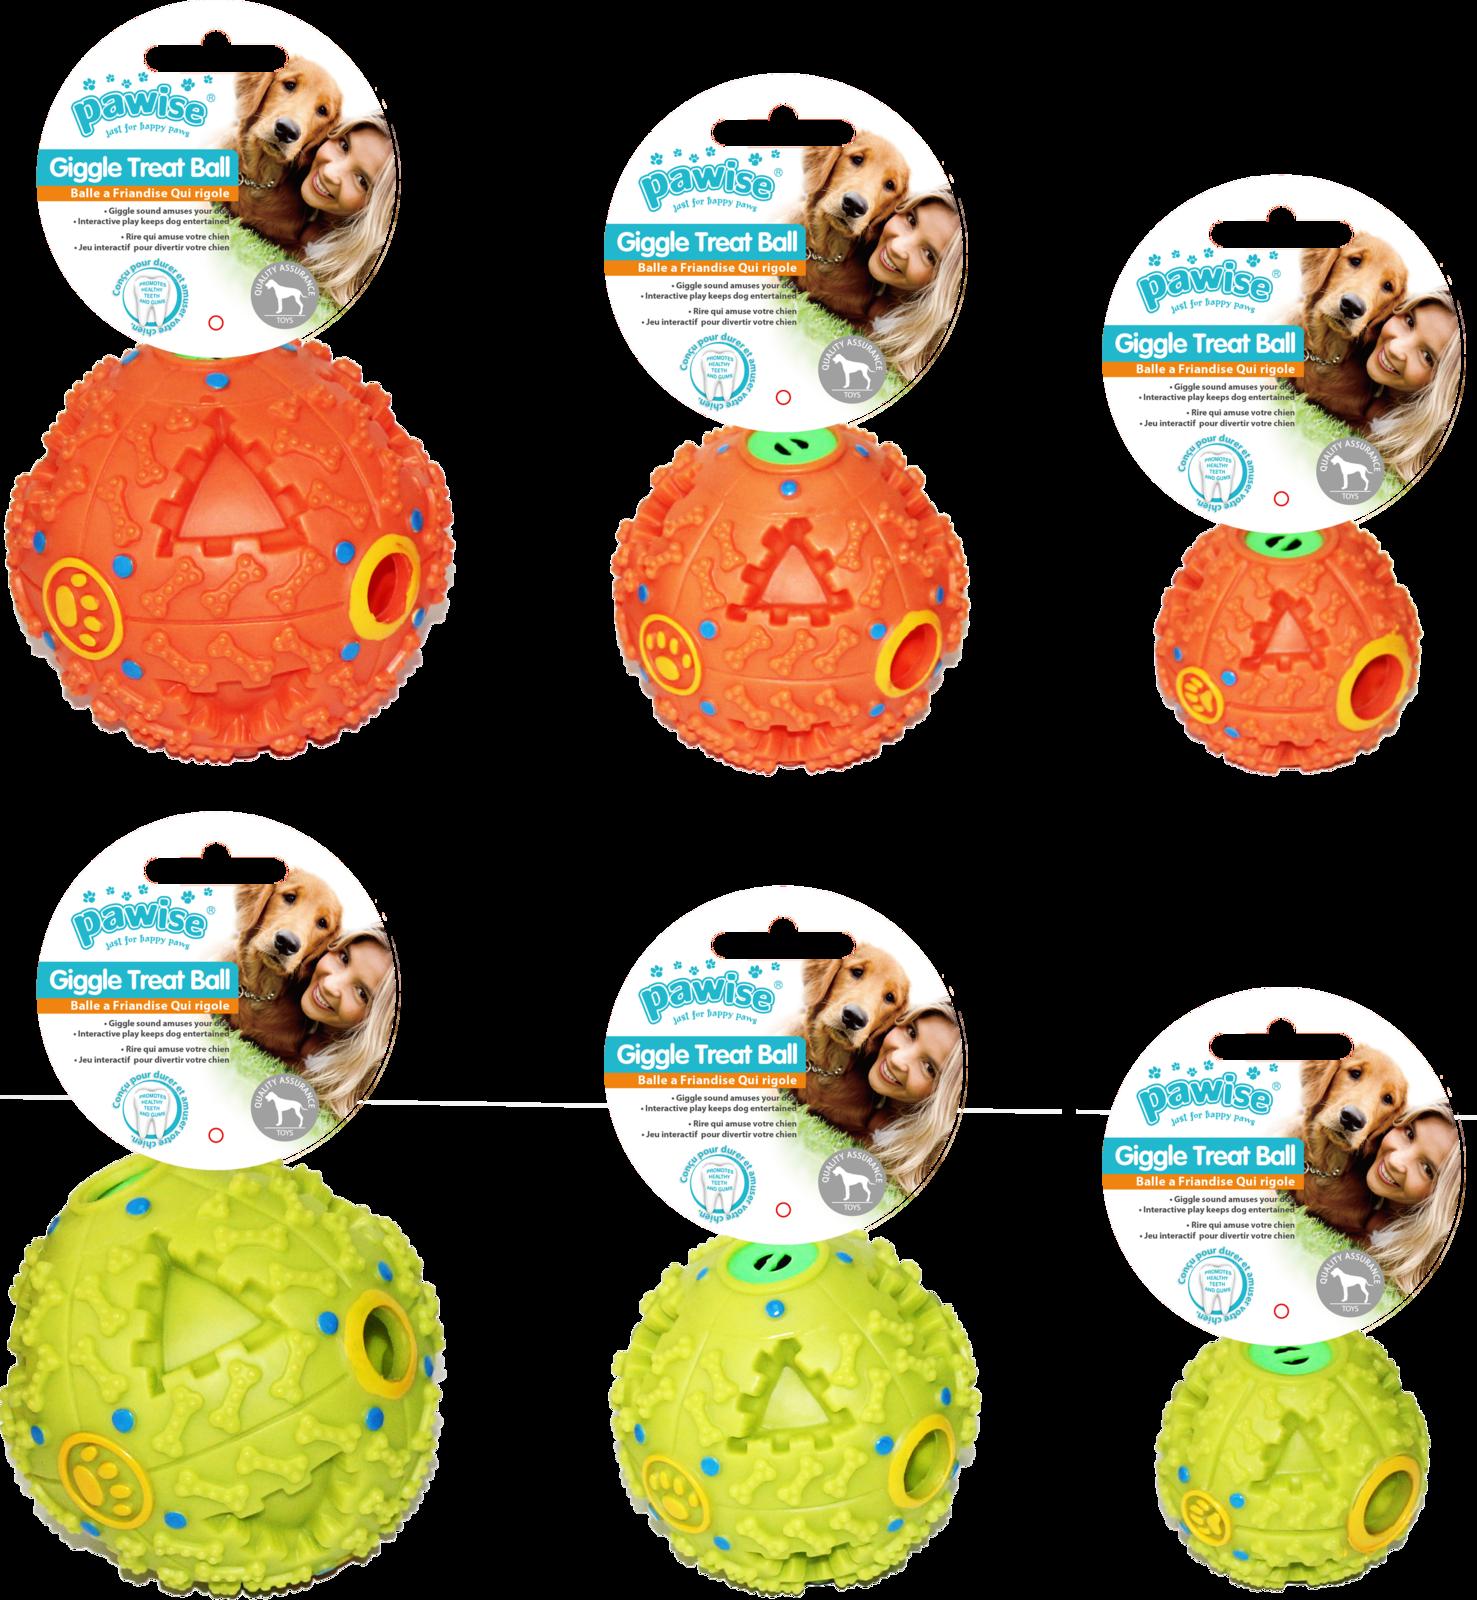 Pawise: Giggle Treat Ball - 11.5 cm image